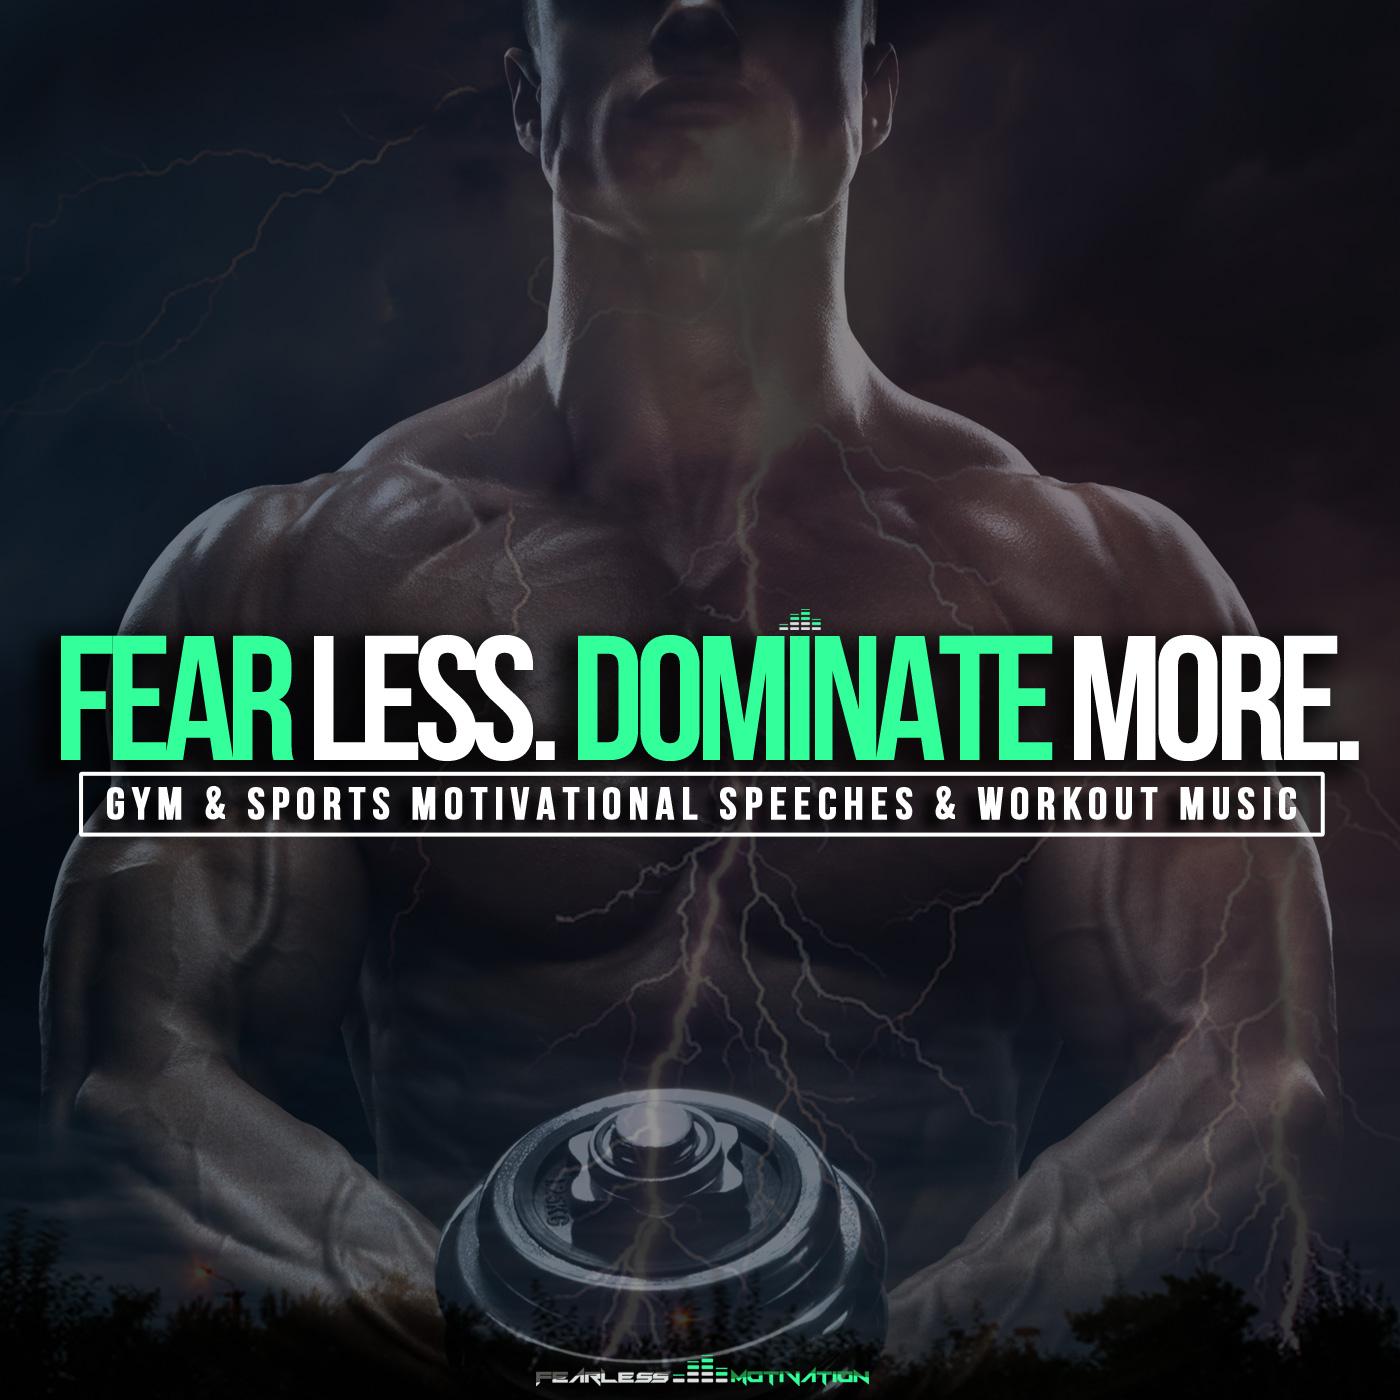 Self Motivation Quotes Wallpaper Fear Less Dominate More Sports Amp Gym Motivational Album